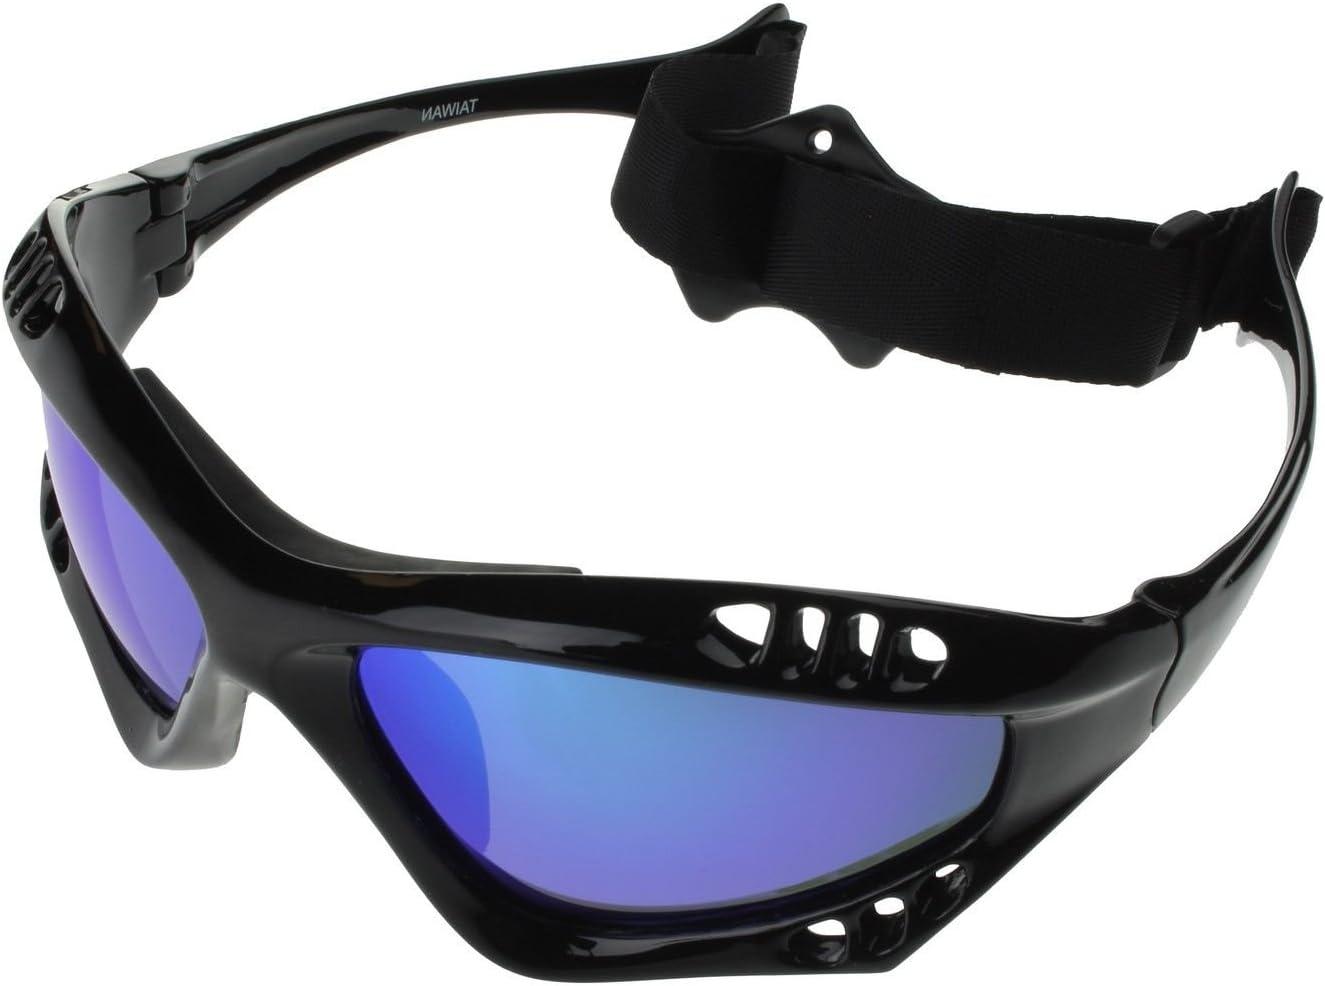 G&G Jetski Sunglasses Polarized Water Sport Surfing Kiteboarding P603 Color Mirror